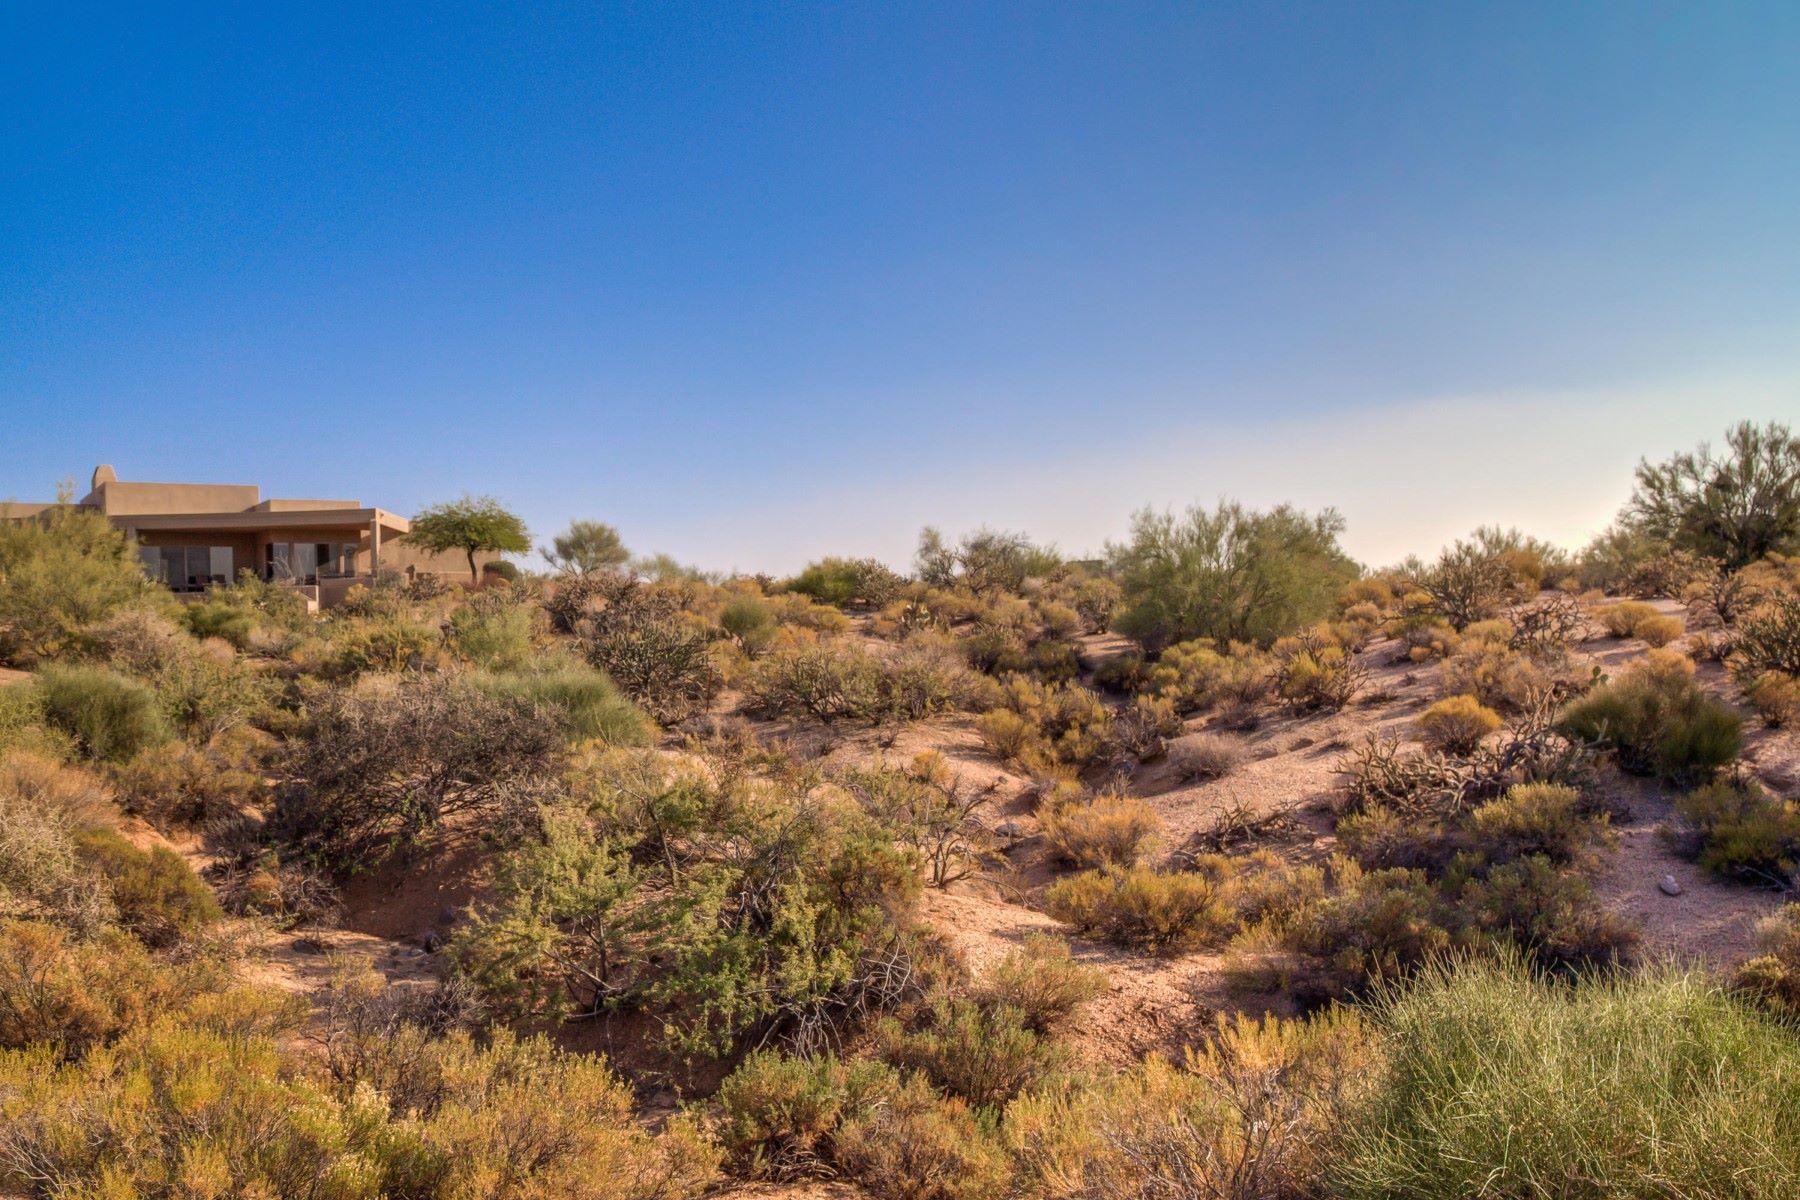 Terreno por un Venta en Just under an acre with beautiful sunset and mountain views 9877 E Miramonte Dr lot 280, Scottsdale, Arizona, 85262 Estados Unidos